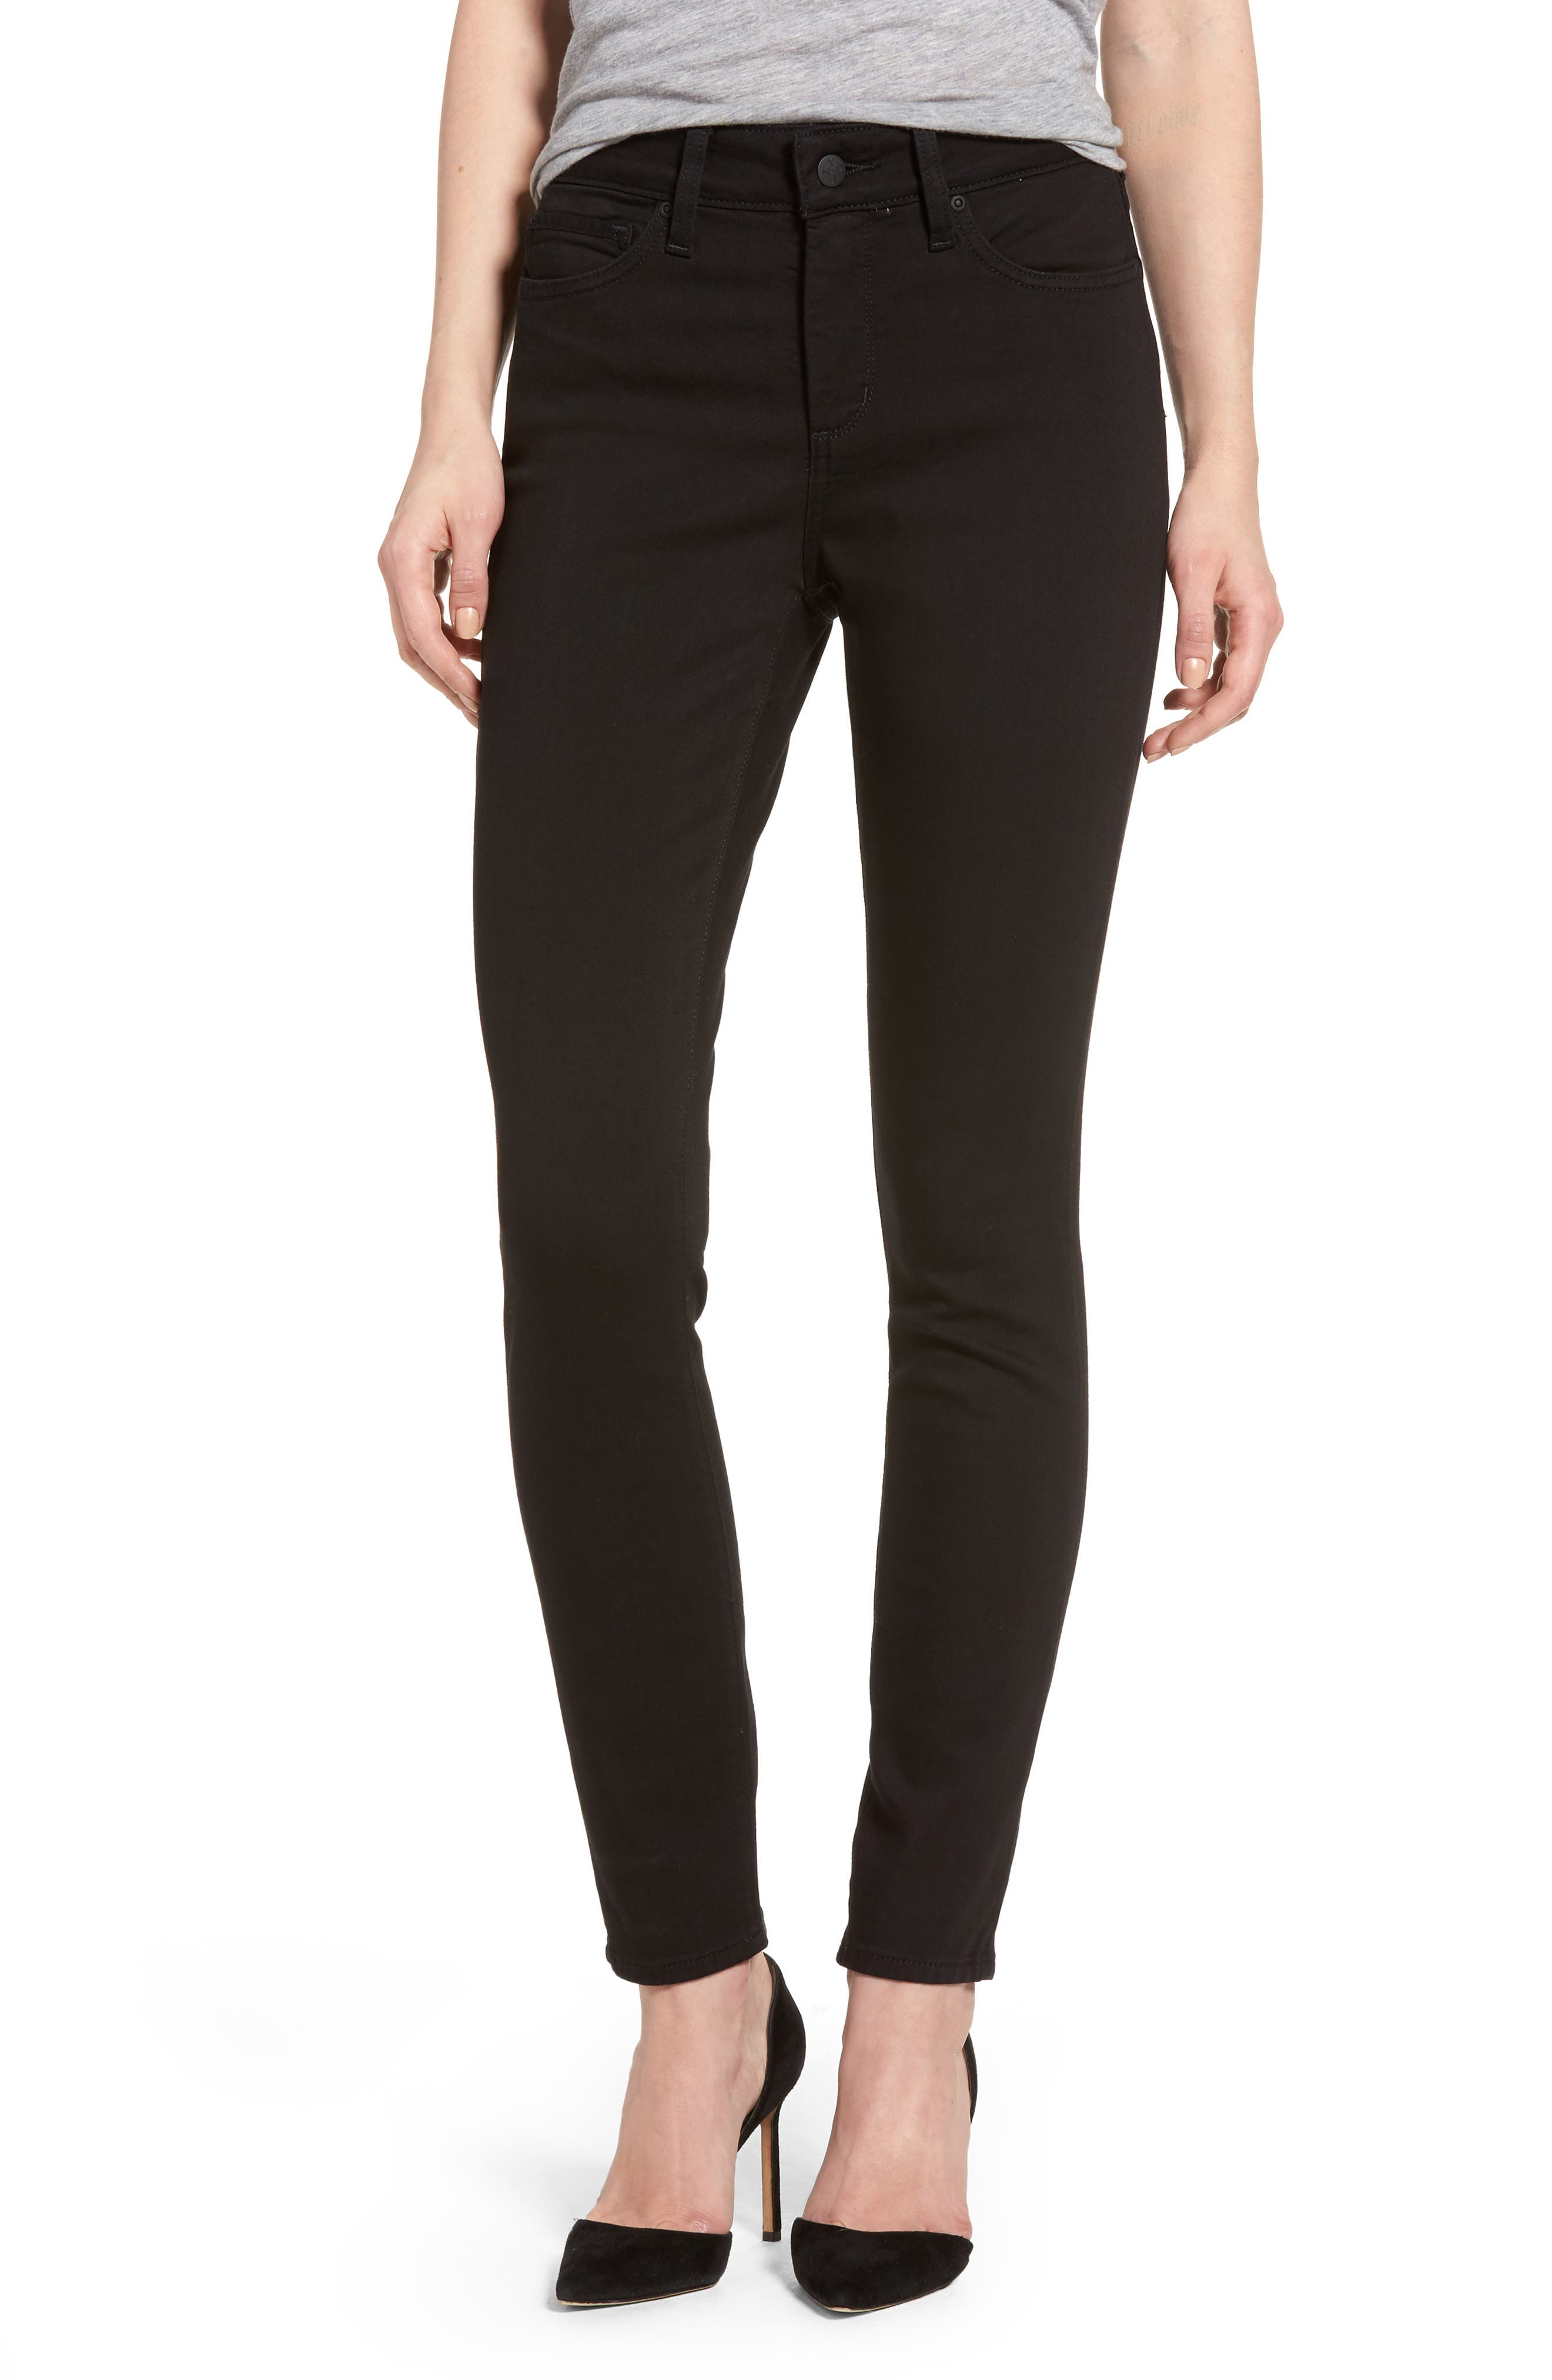 Main Image - NYDJ Ami Stretch Skinny Jeans (Regular & Petite)